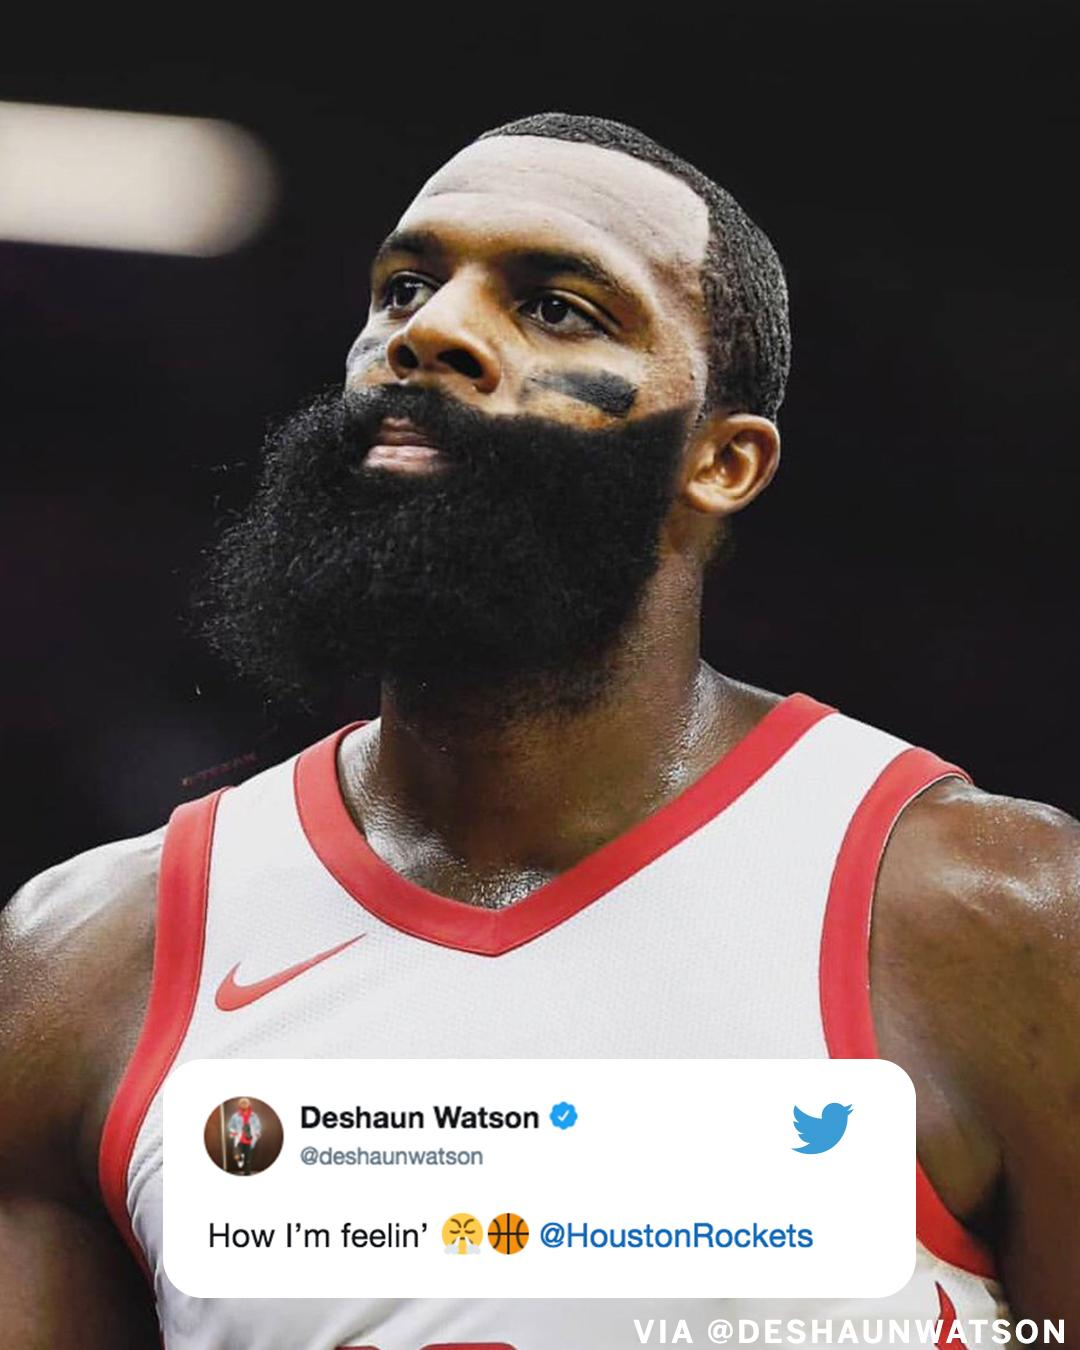 James Harden's big Game 4 has Deshaun Watson in a Beard kinda mood. https://t.co/BNlKMIpLWd